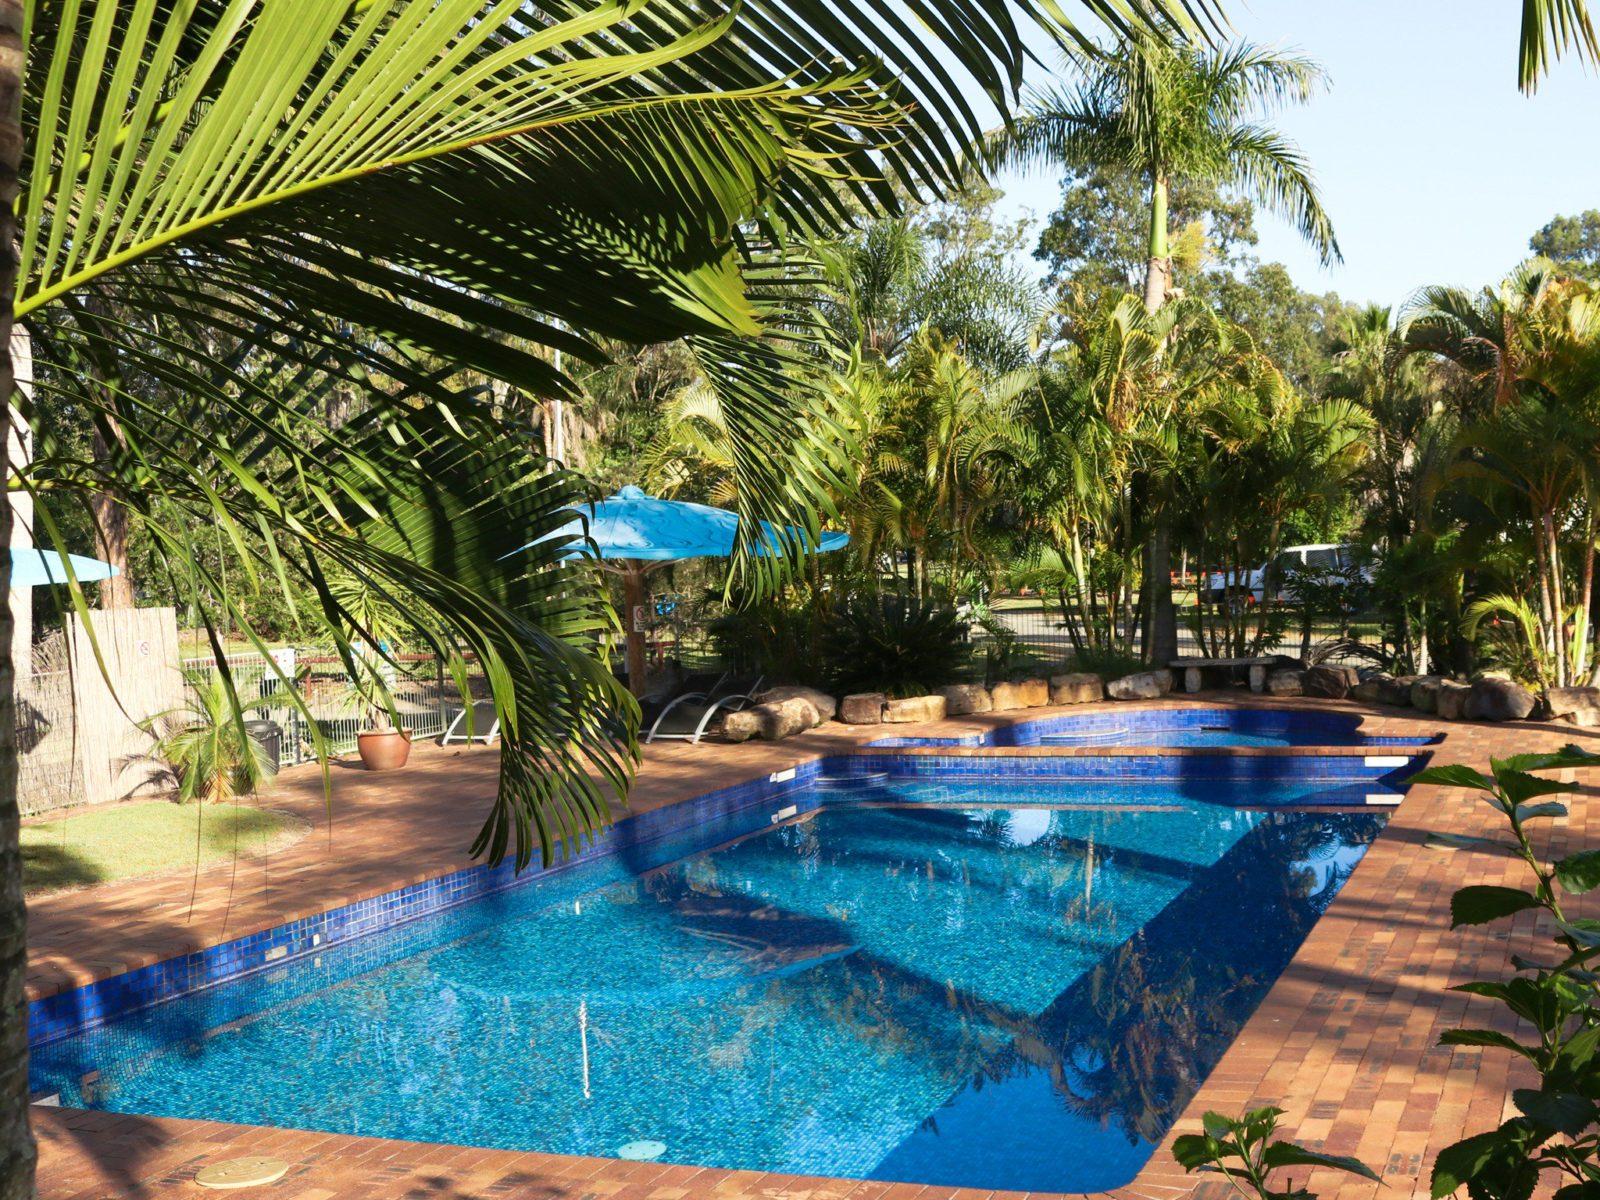 Secura Lifestyle Dreamtime Coomera Pool